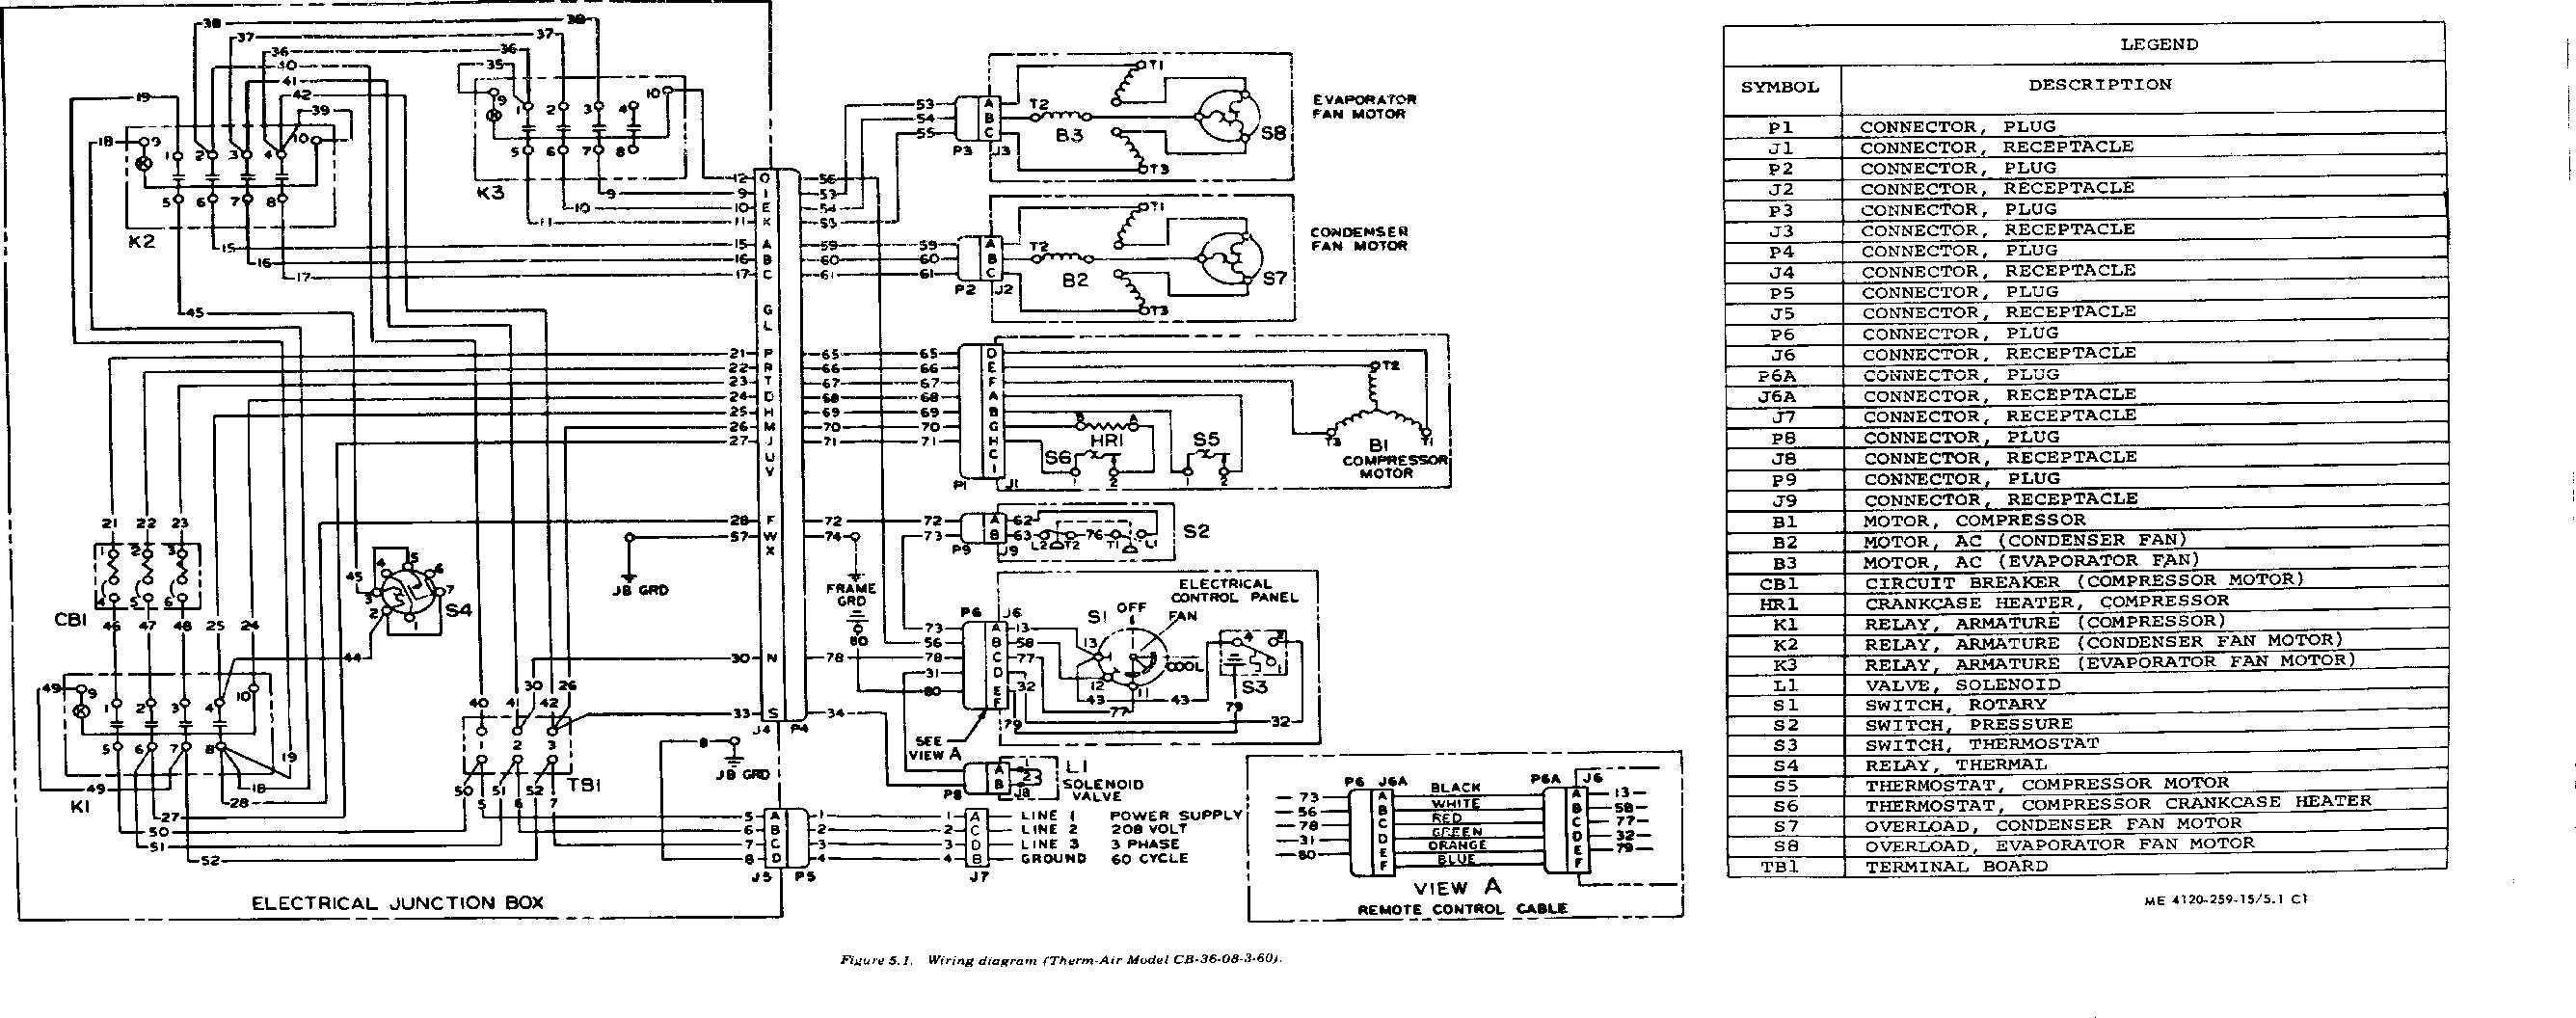 DIAGRAM] Oreck Xl 9800 Wiring Diagram FULL Version HD Quality Wiring Diagram  - WIRING-DIAGRAM.LOVECON.FRDiagram Database - Lovecon.fr